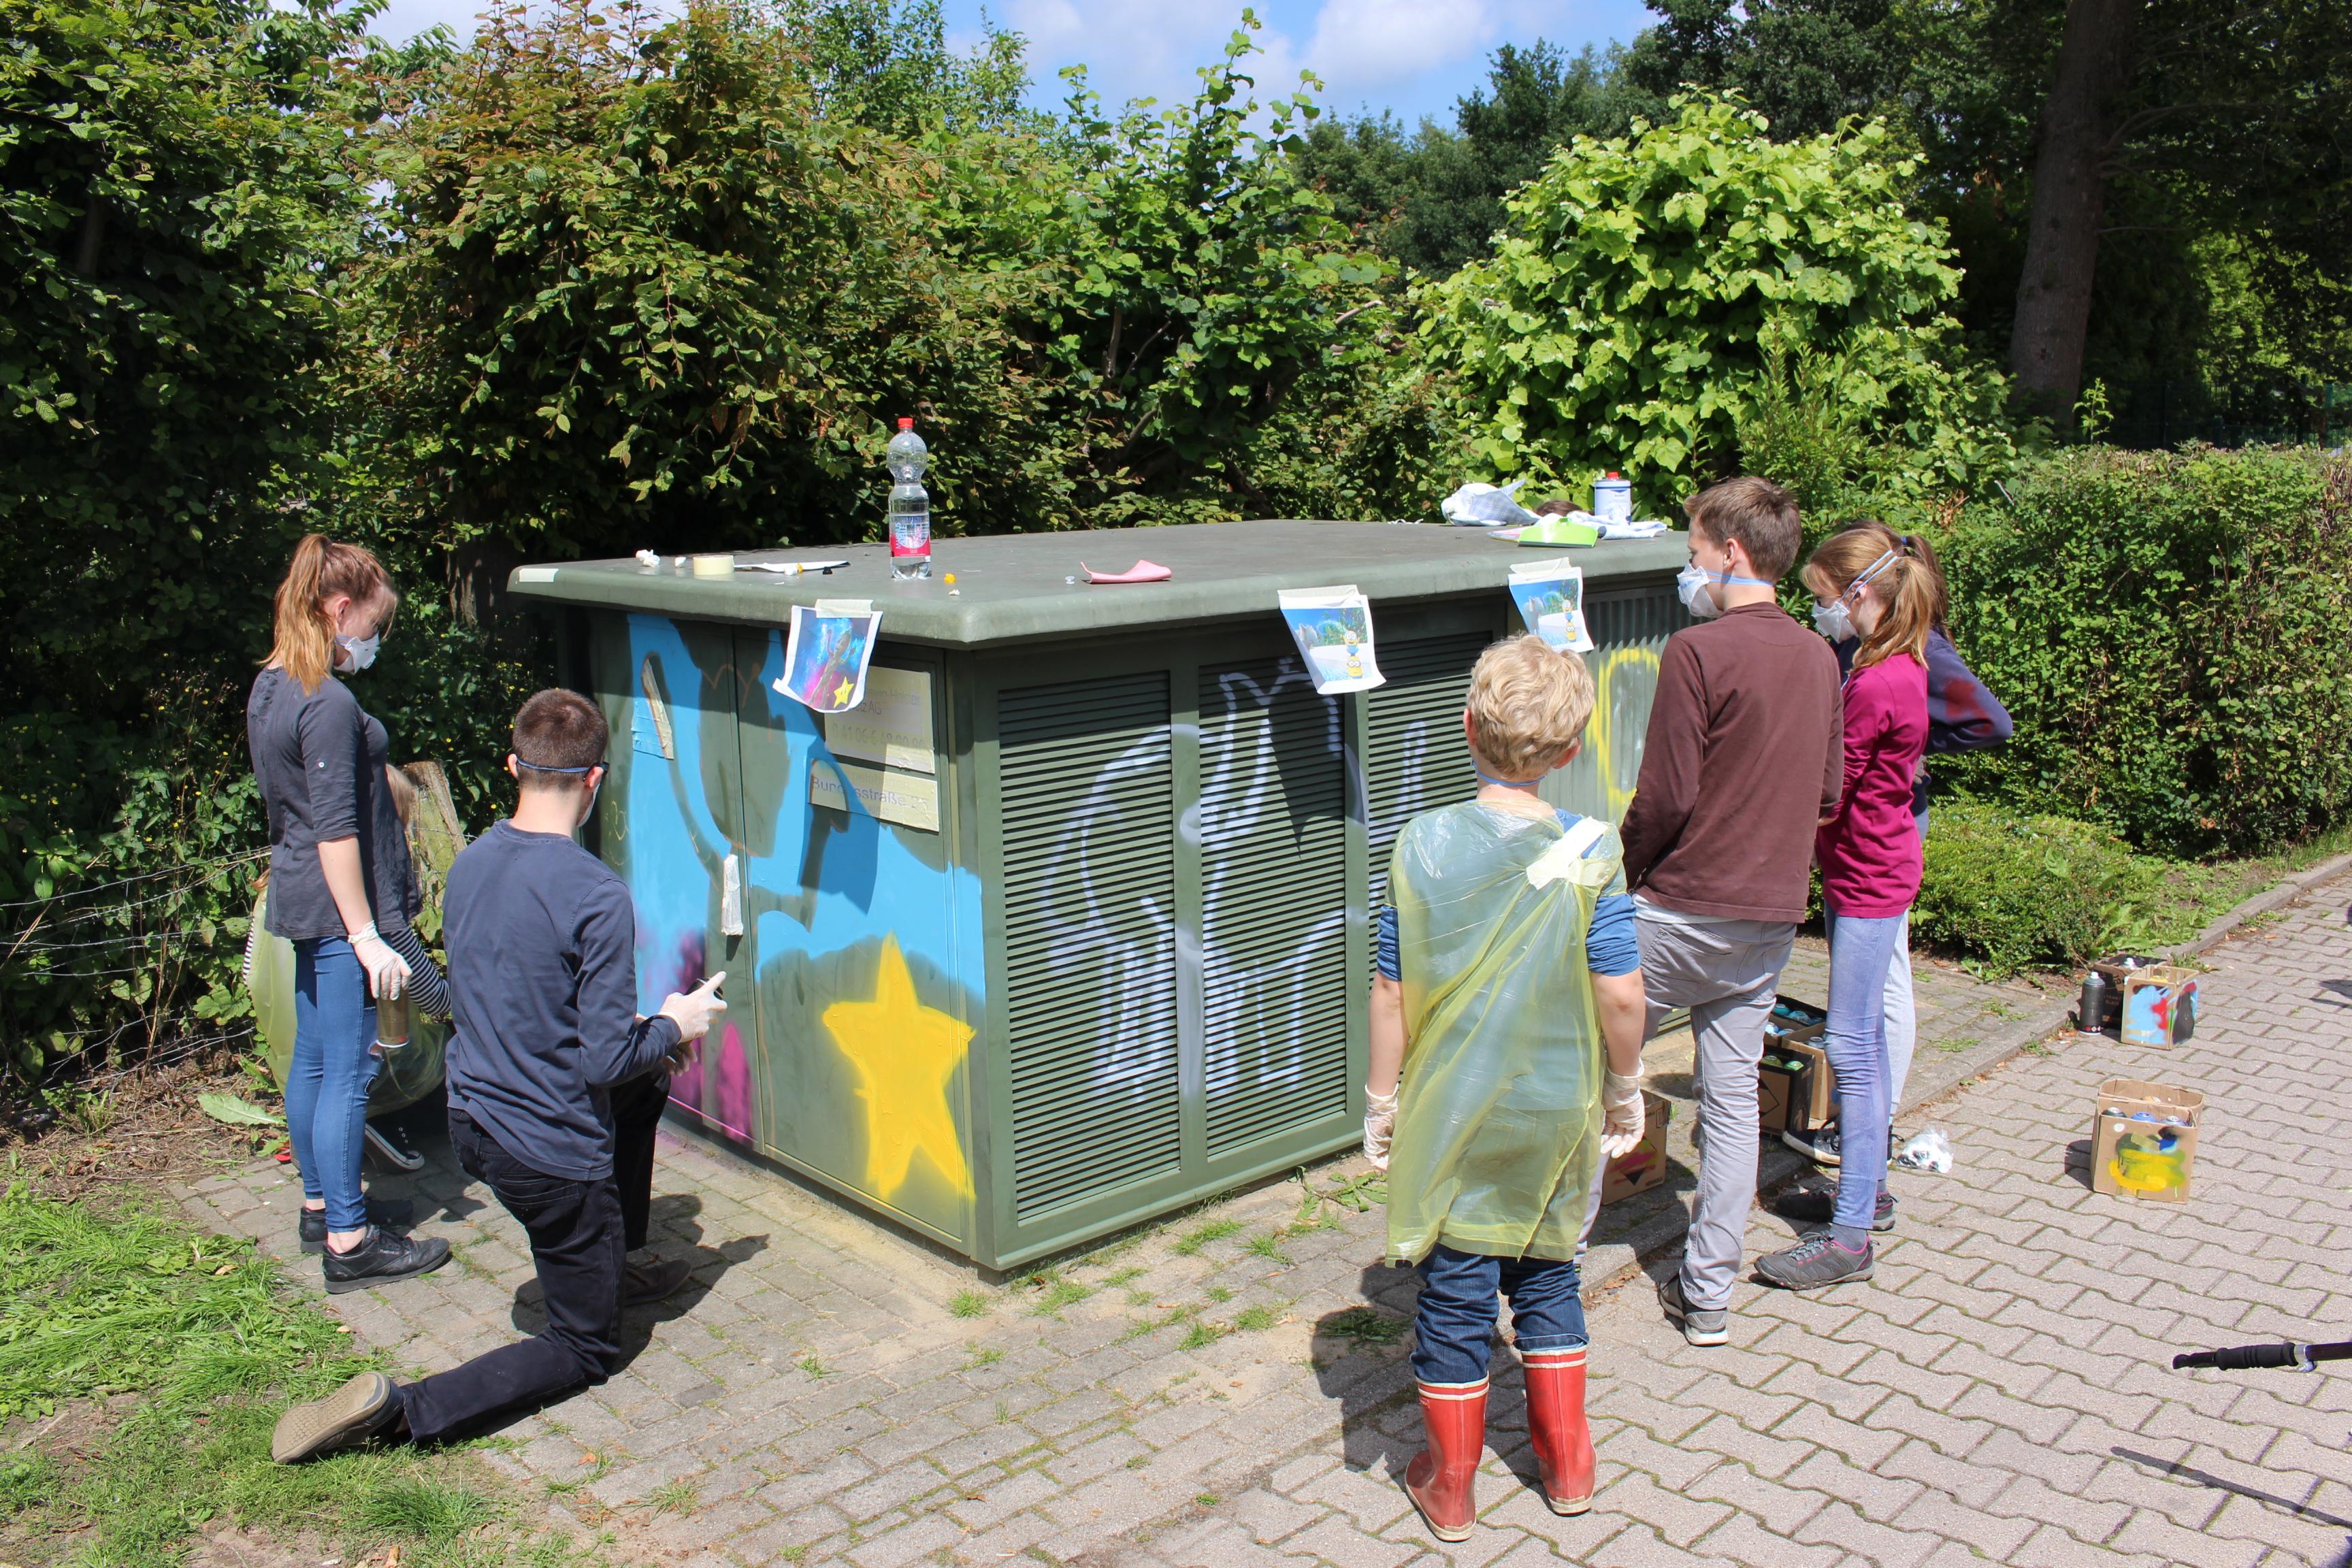 Graffitiprojekt Jugendtreff Kröppelshagen